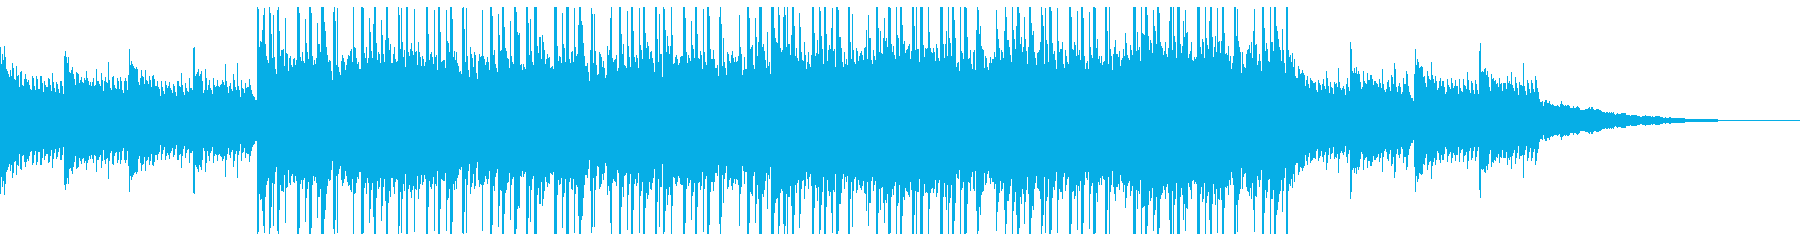 CMや動画のBGMにおすすめ!の再生済みの波形